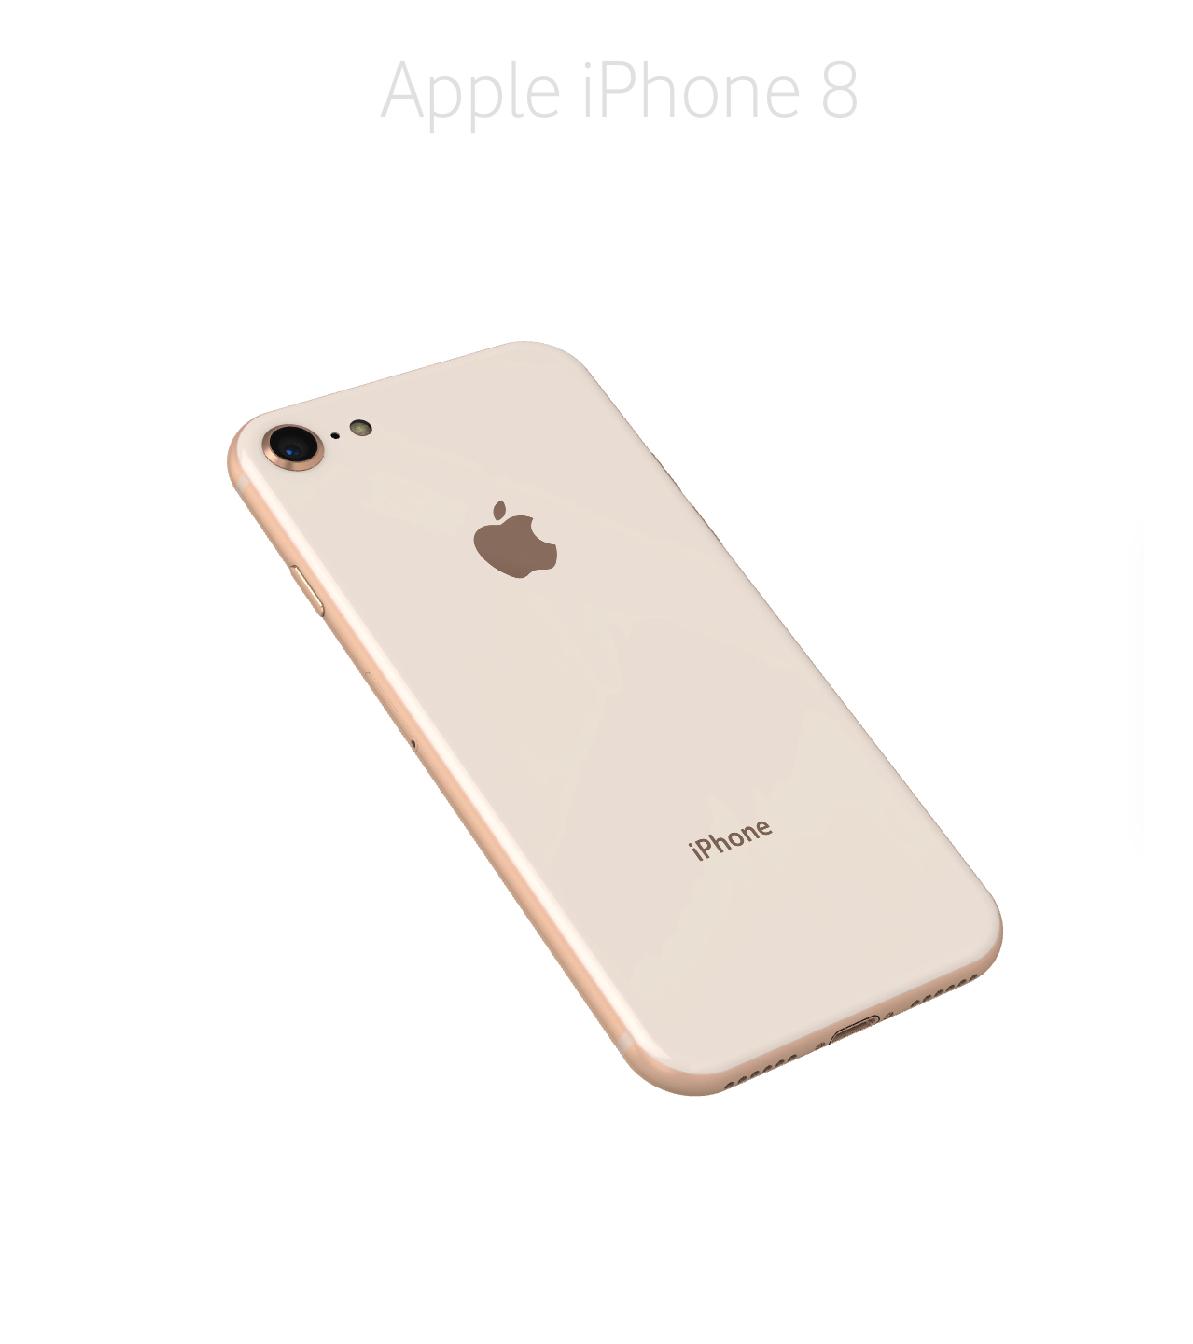 Laga baksida/glas iPhone 8